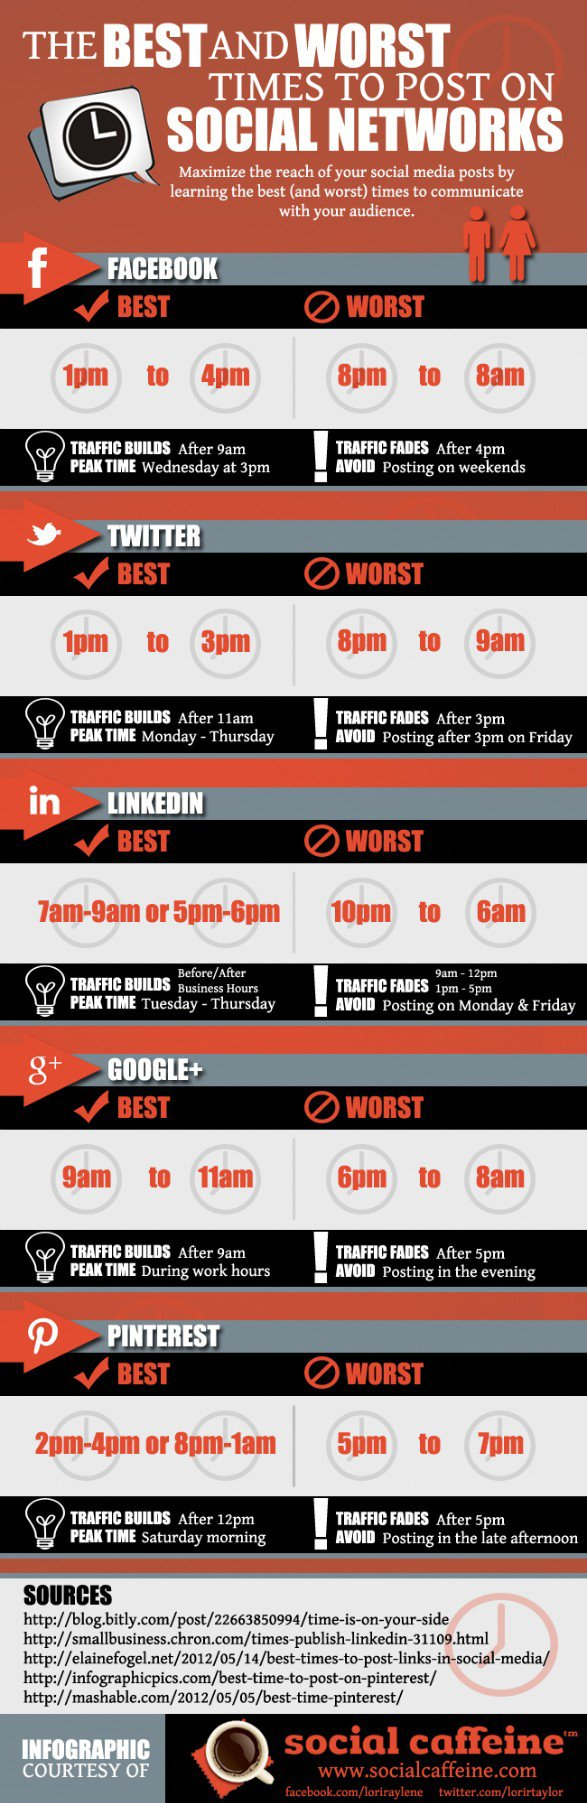 infographic-18.jpg